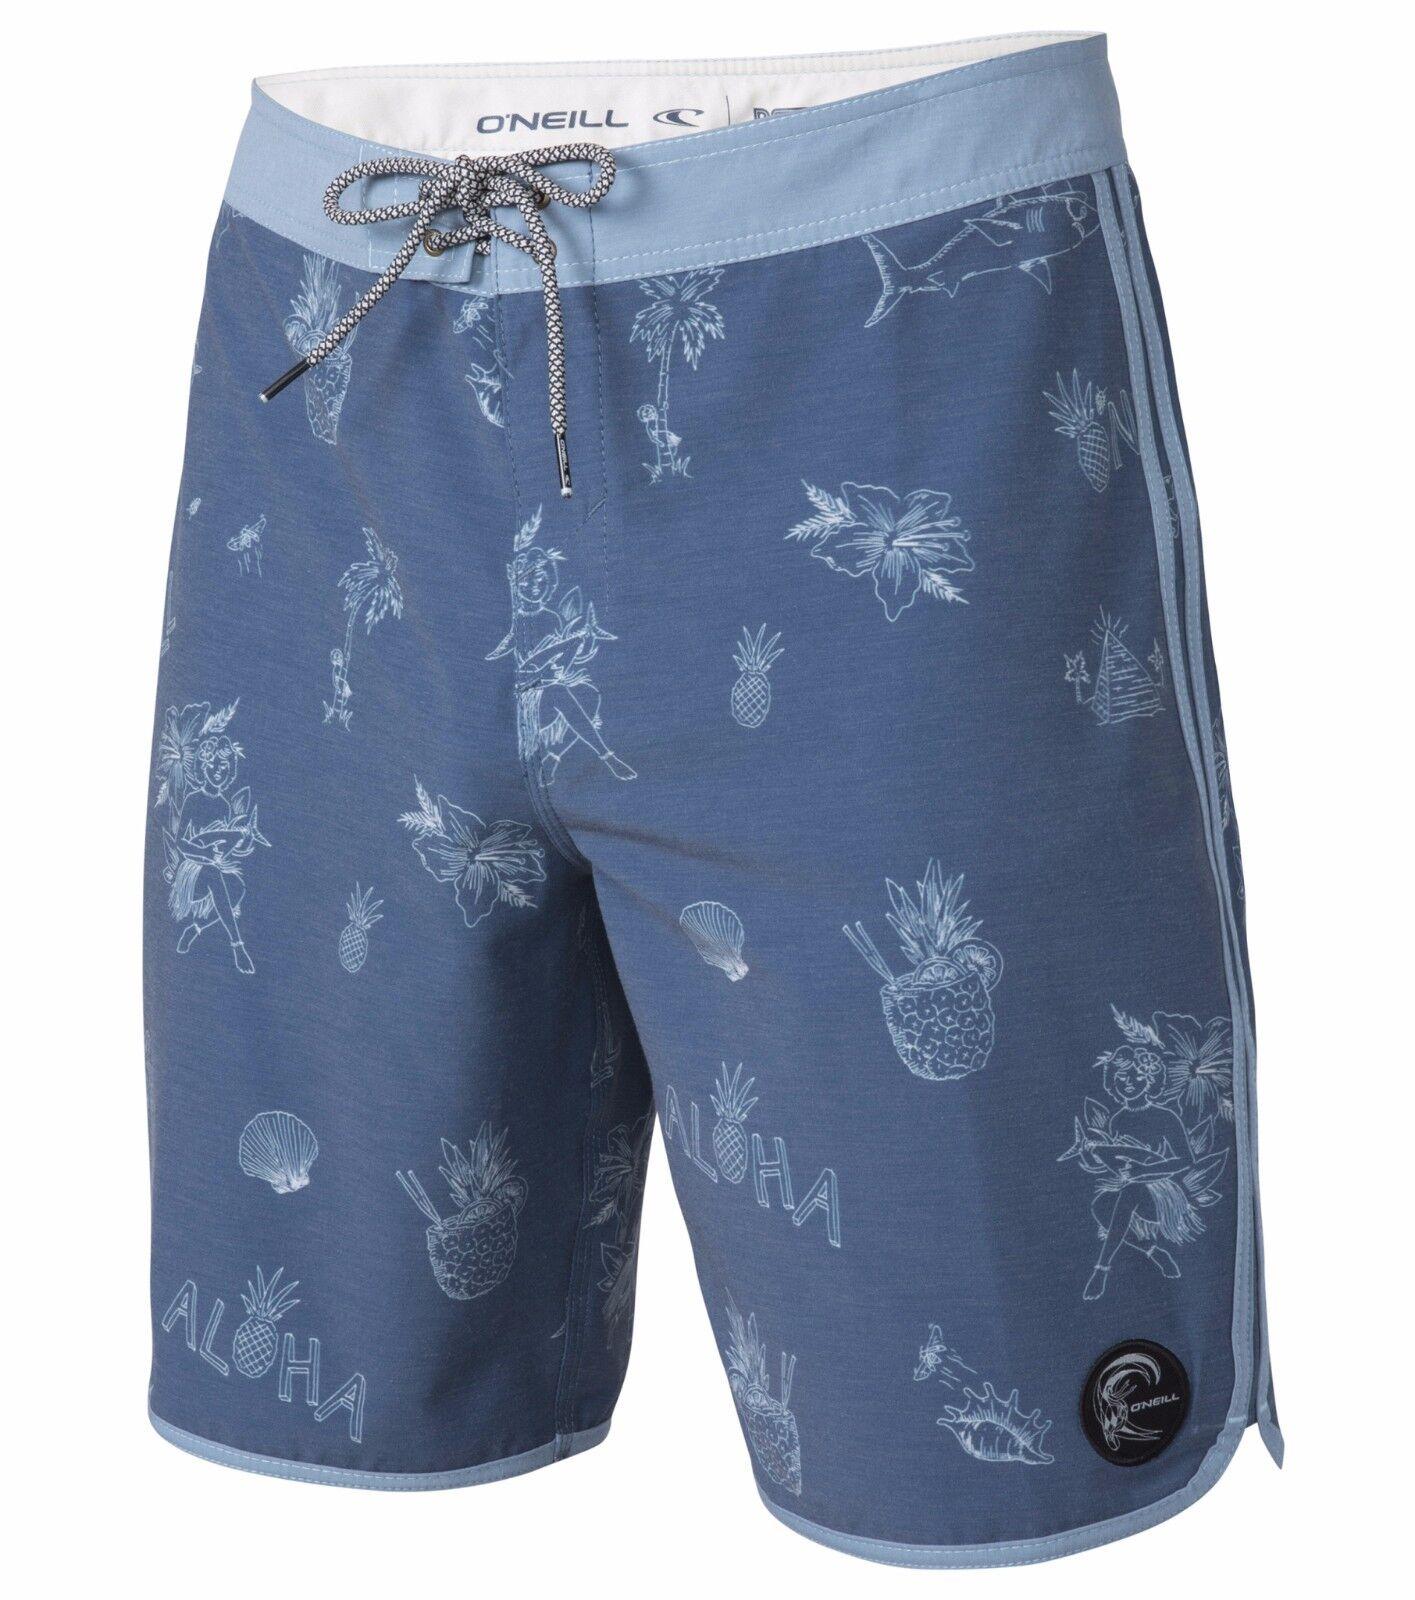 O'Neill RETROFREAK BRALOHA Mens Polyester Cotton Boardshorts Size 32 NEW 2017